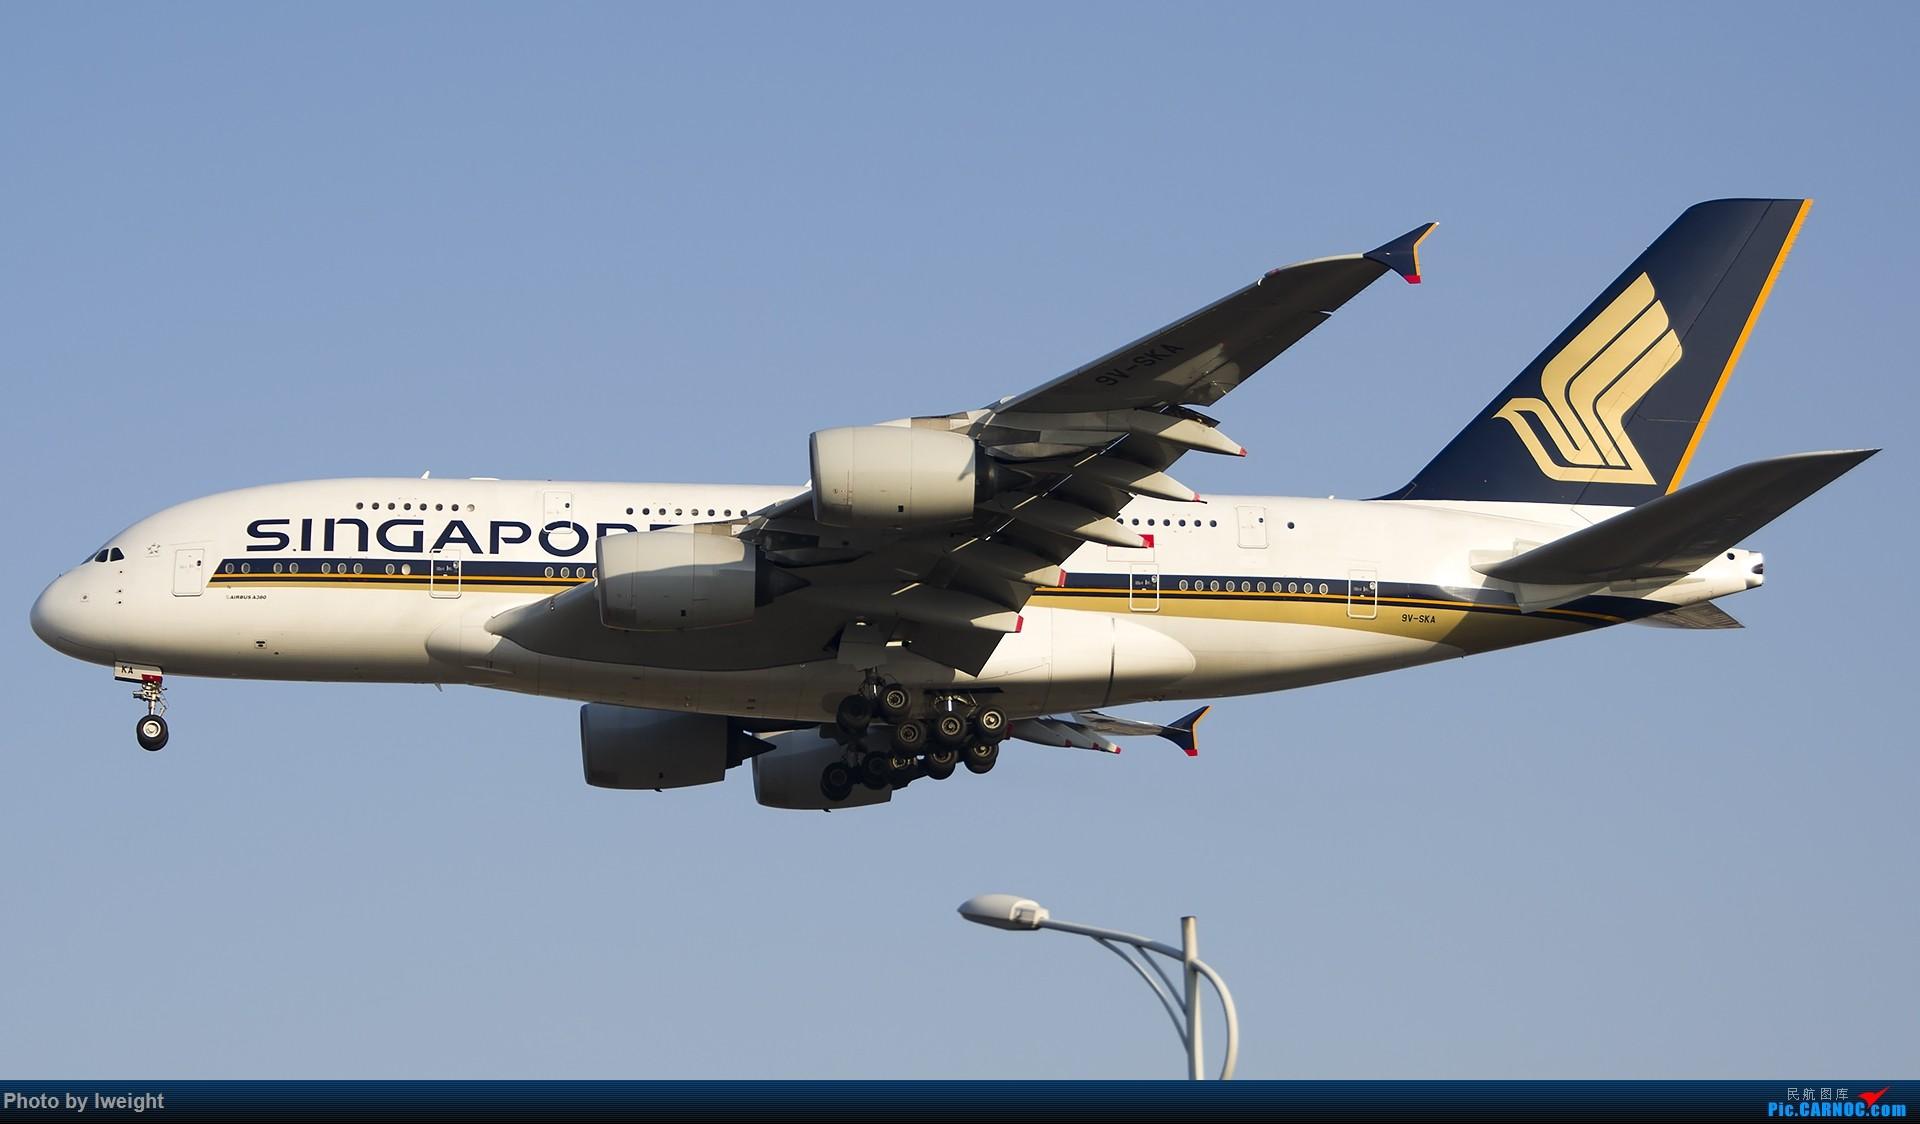 Re:[原创]庆祝升级777,发上今天在首都机场拍的所有飞机【2014-12-14】 AIRBUS A380 9V-SKA 中国北京首都国际机场